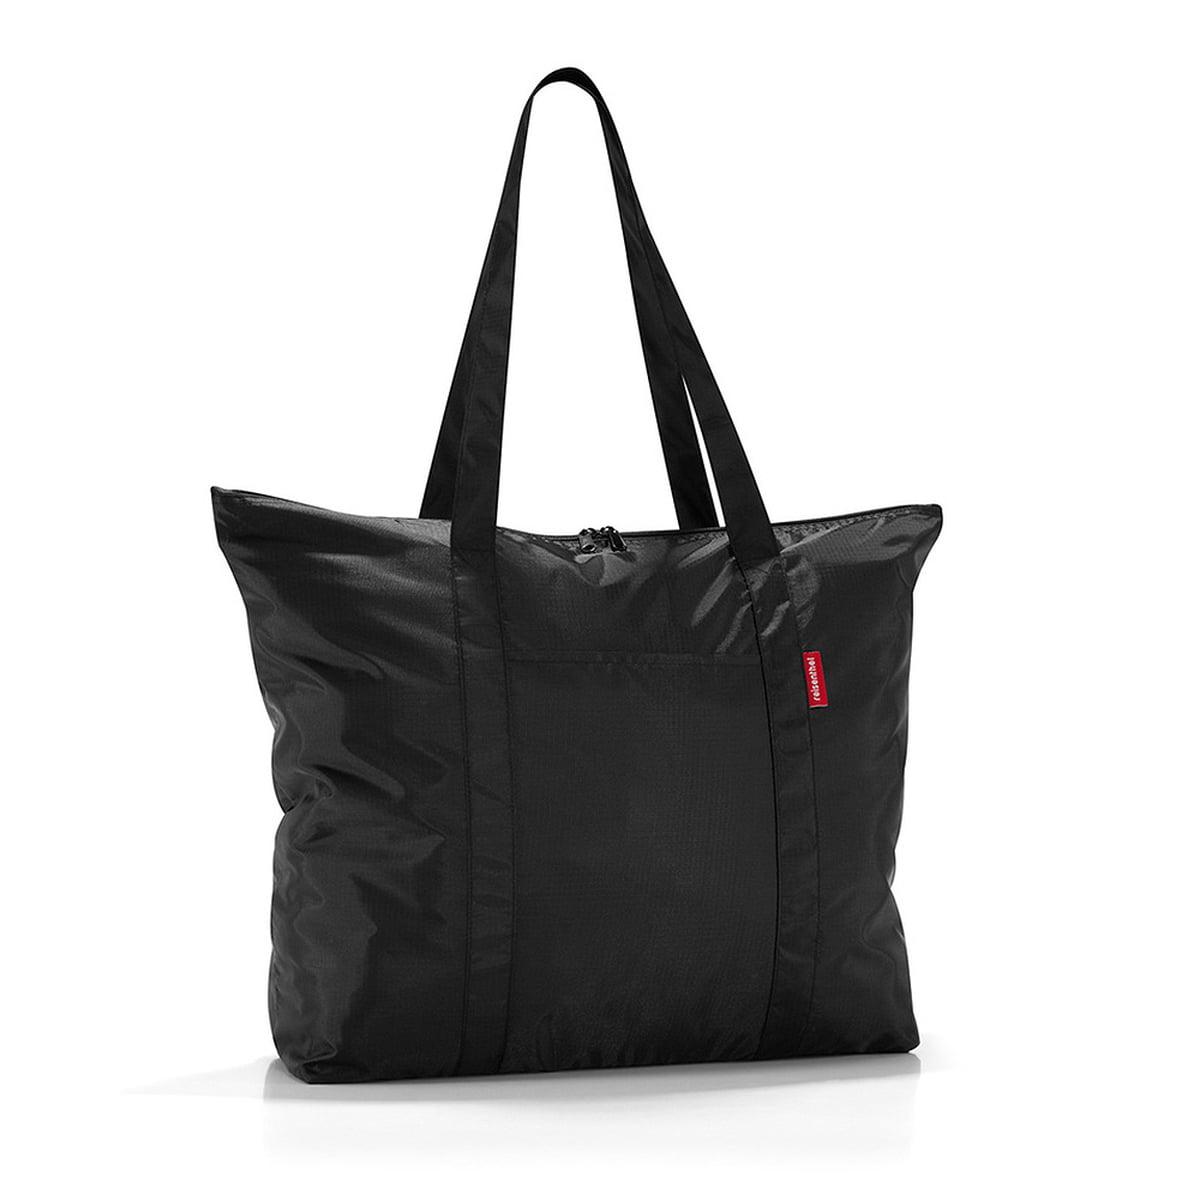 reisenthel - mini maxi travelshopper, black